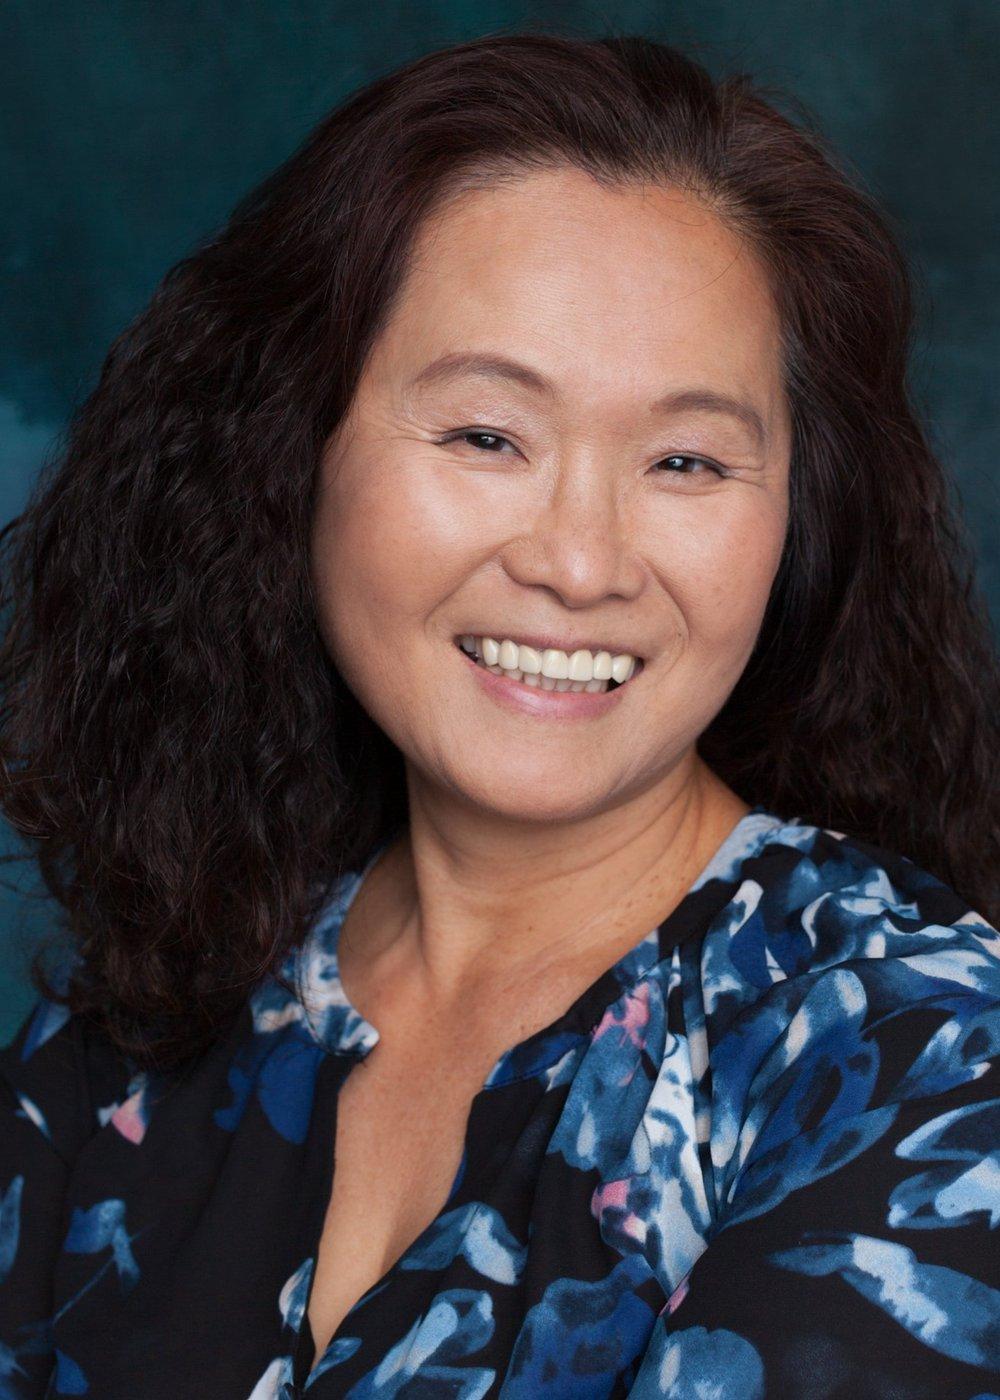 Ms. Hiromi Moreton